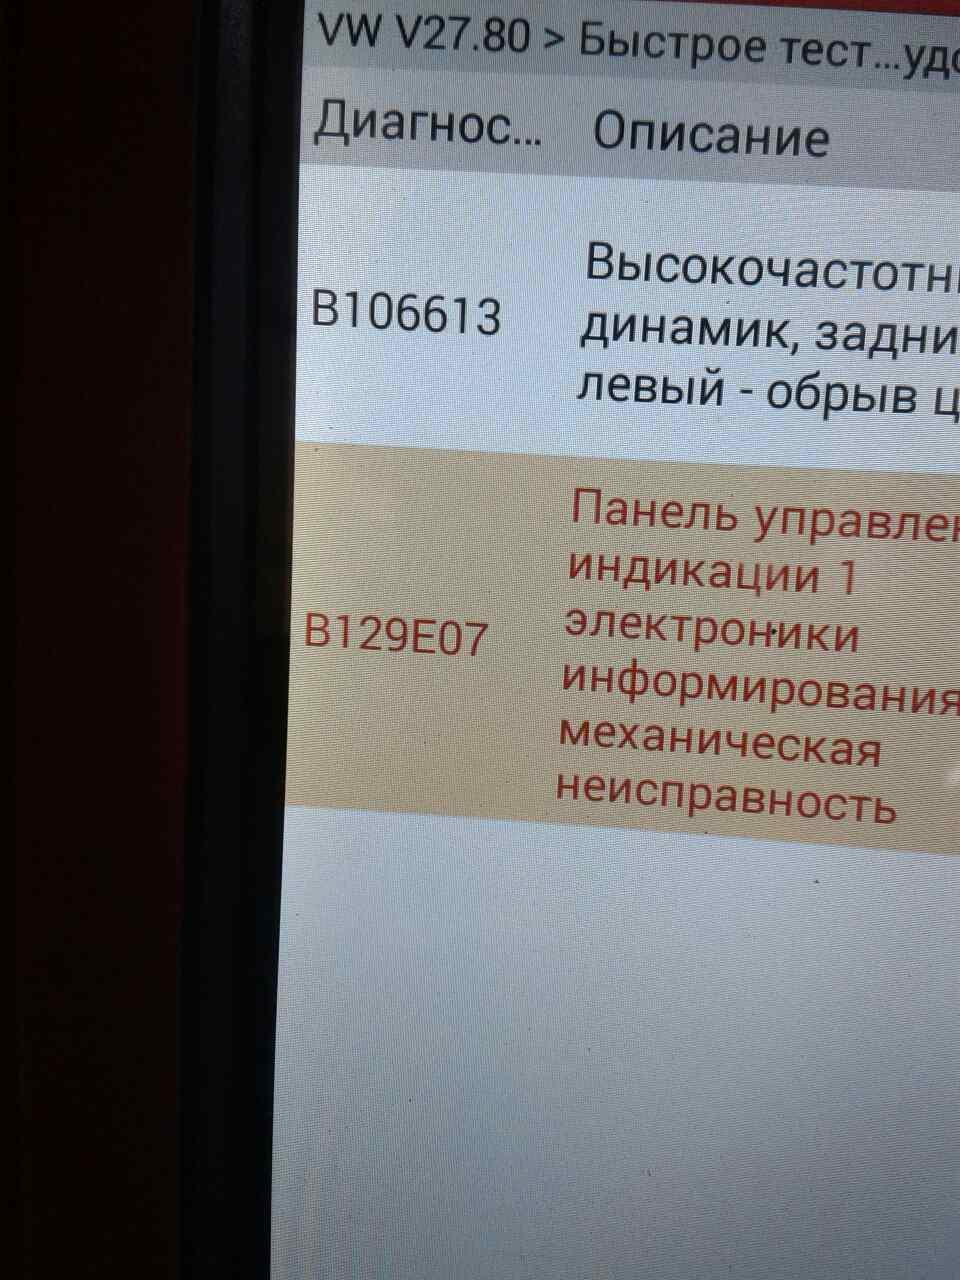 http://ipic.su/img/img7/fs/0-02-05-cfe77109fa9b097f32a6a755ad2cc7550b91162508492fc173cfcb6a90338445_full.1491756677.jpg